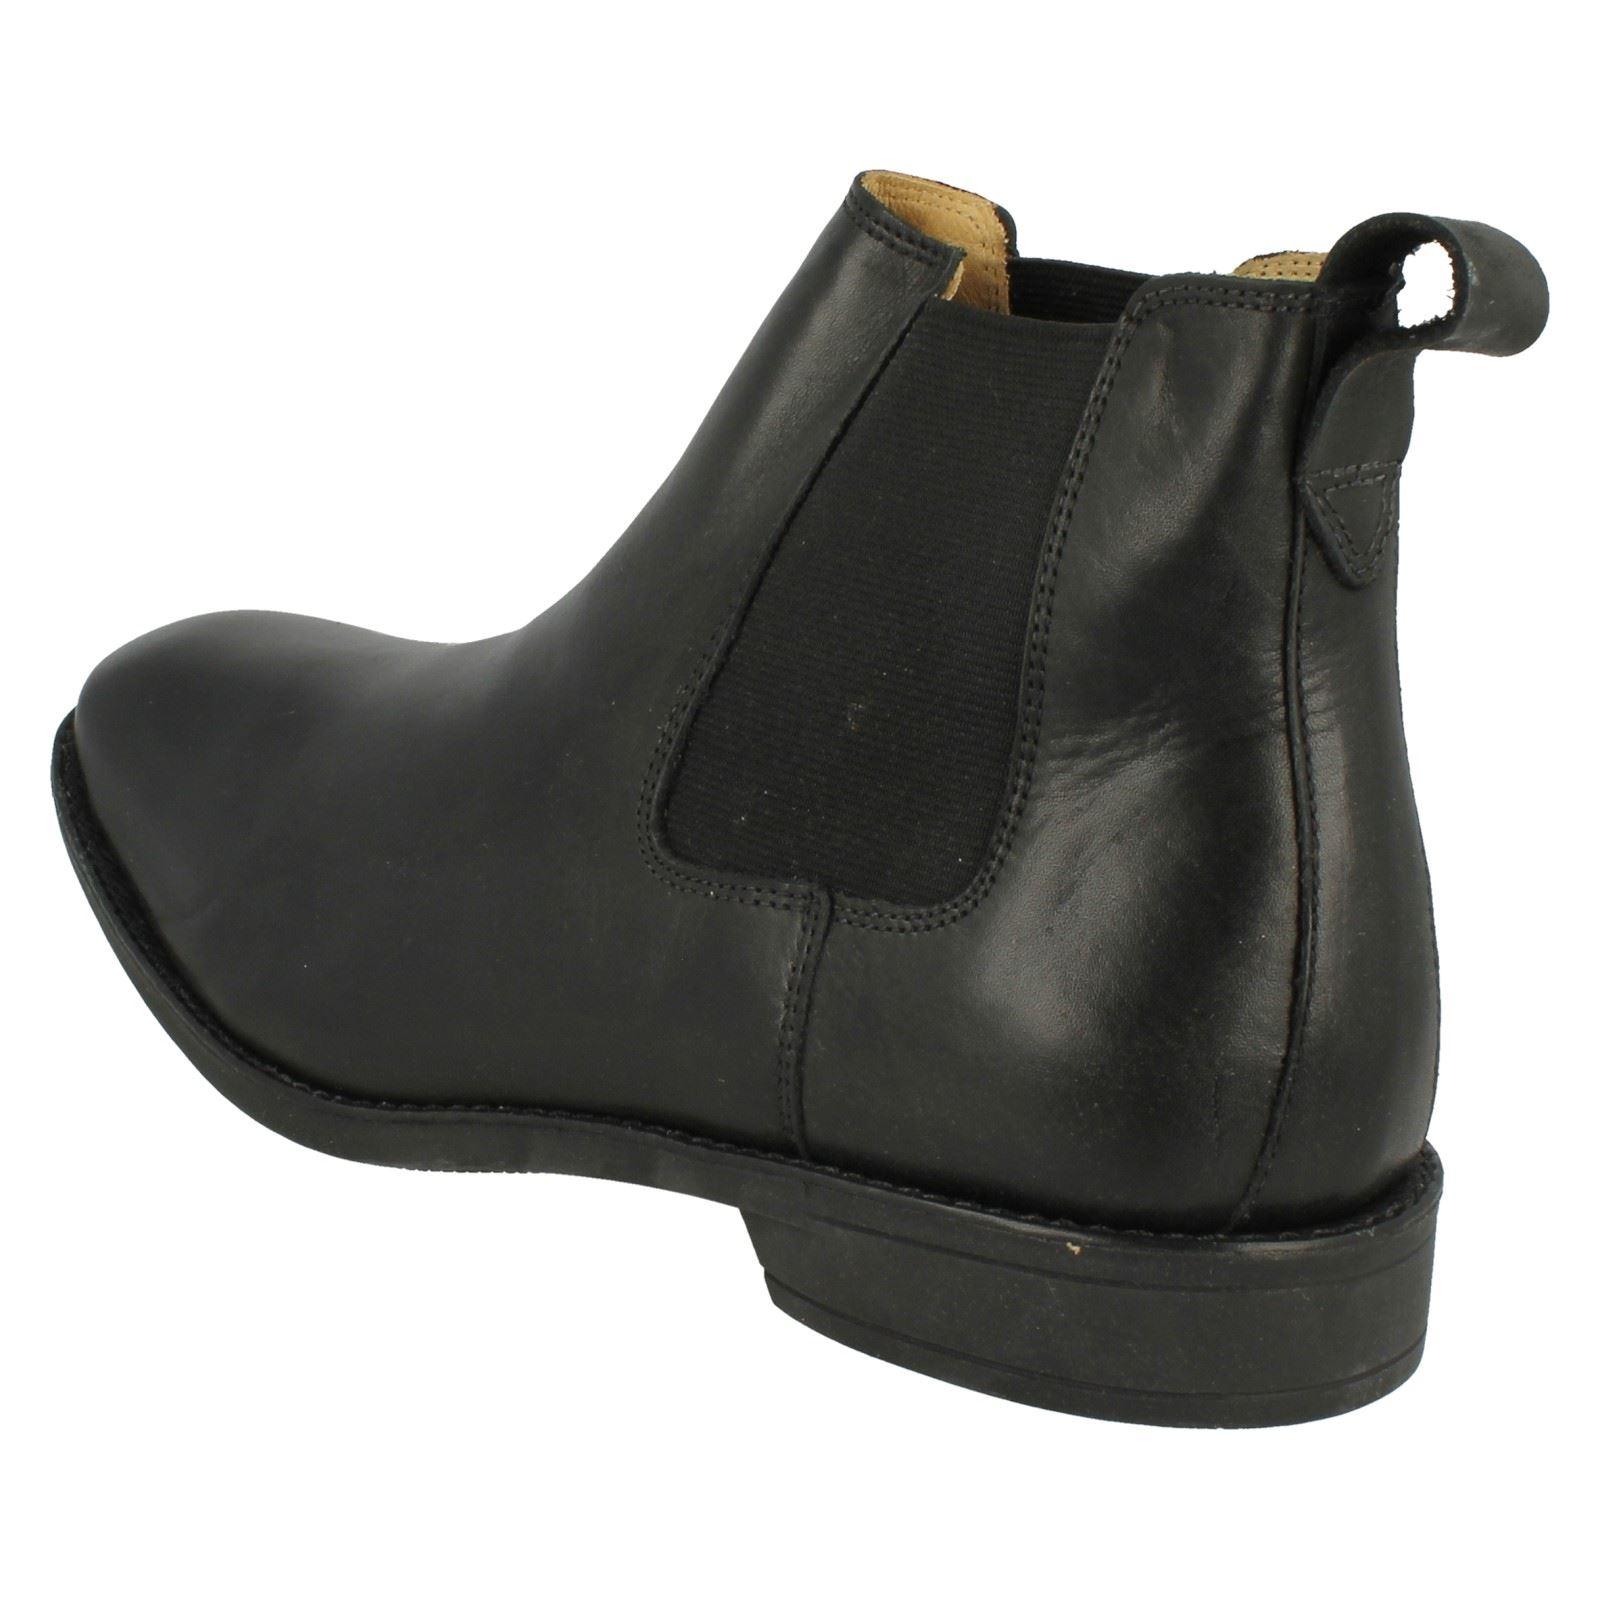 Mens-Anatomic-Chelsea-Boots-039-929211LB-039 thumbnail 10